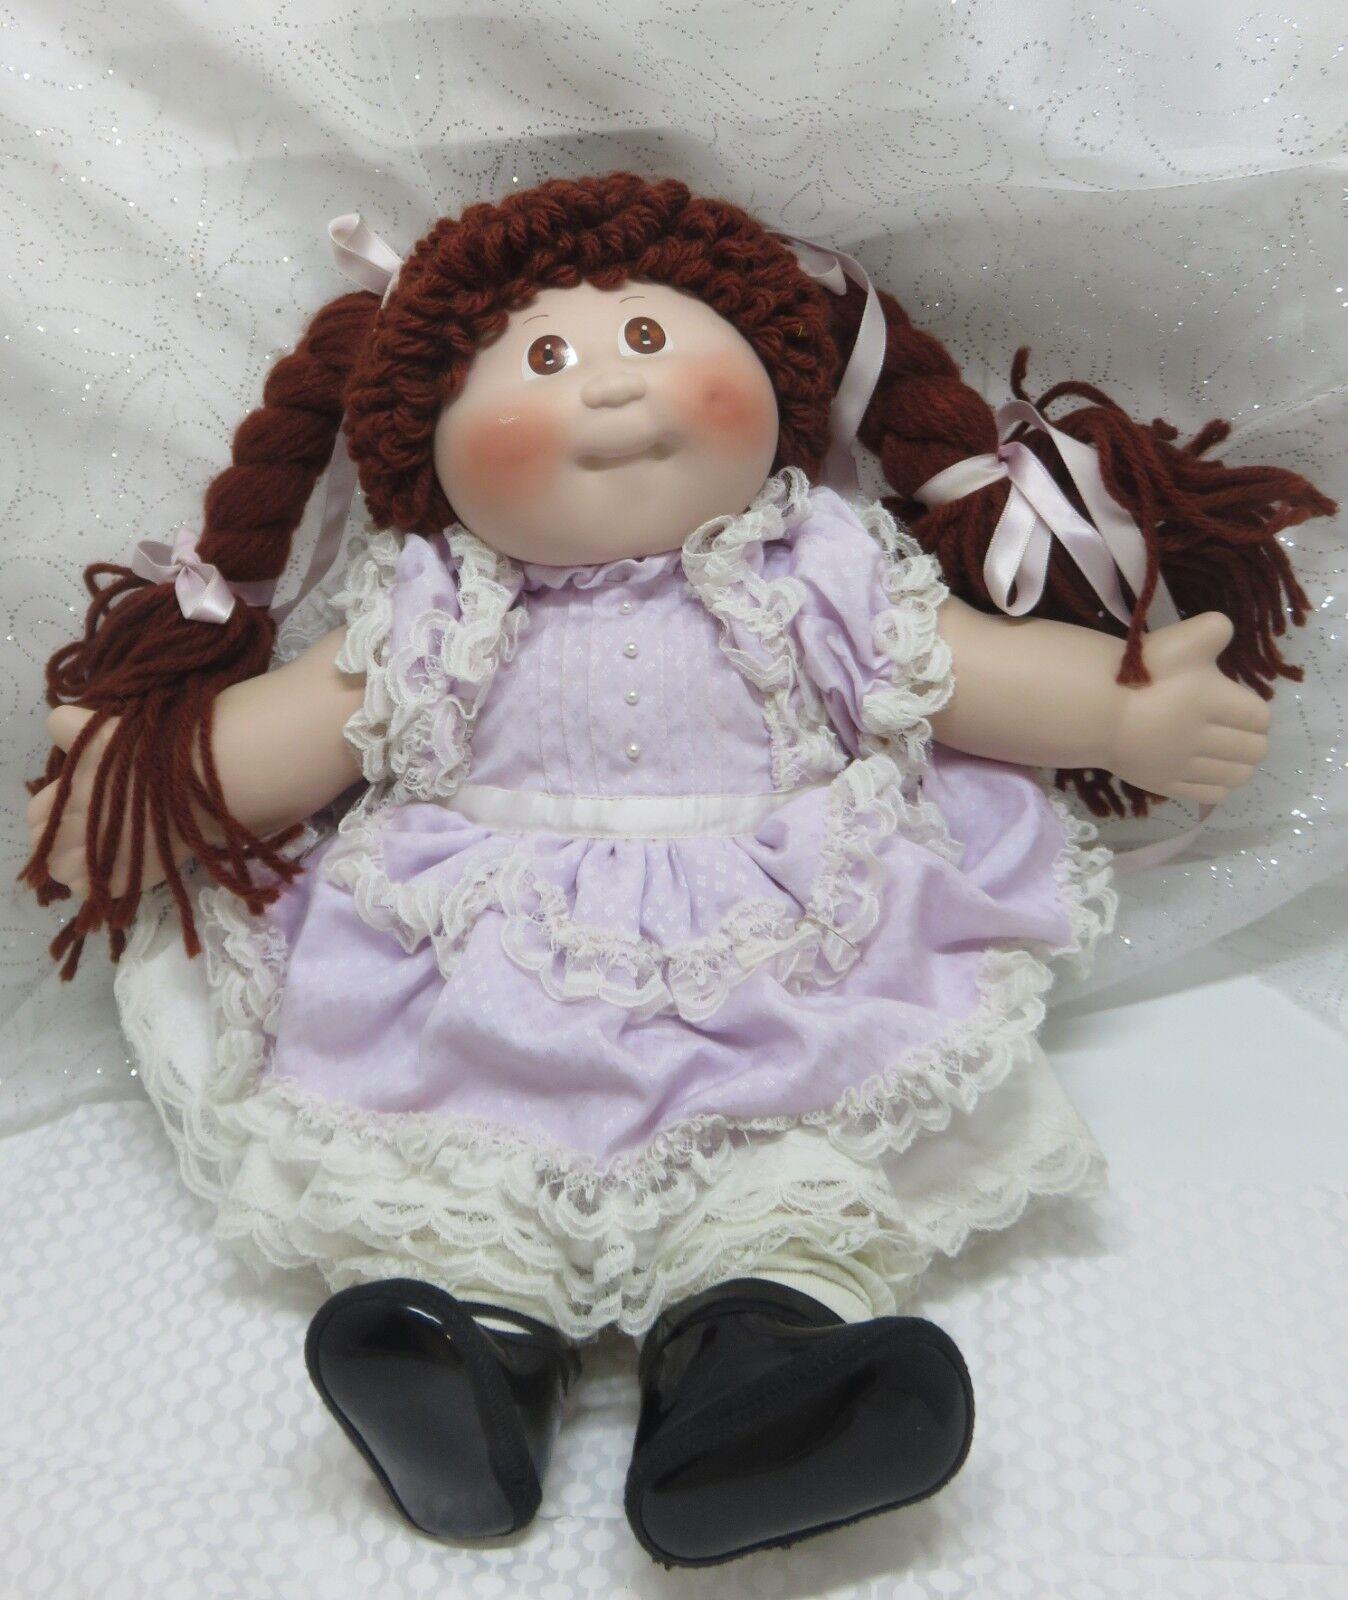 VTG NIB 1985 Porcelain Cabbage Patch braun Eyed Brunette Stephanie Anne Ltd Ed